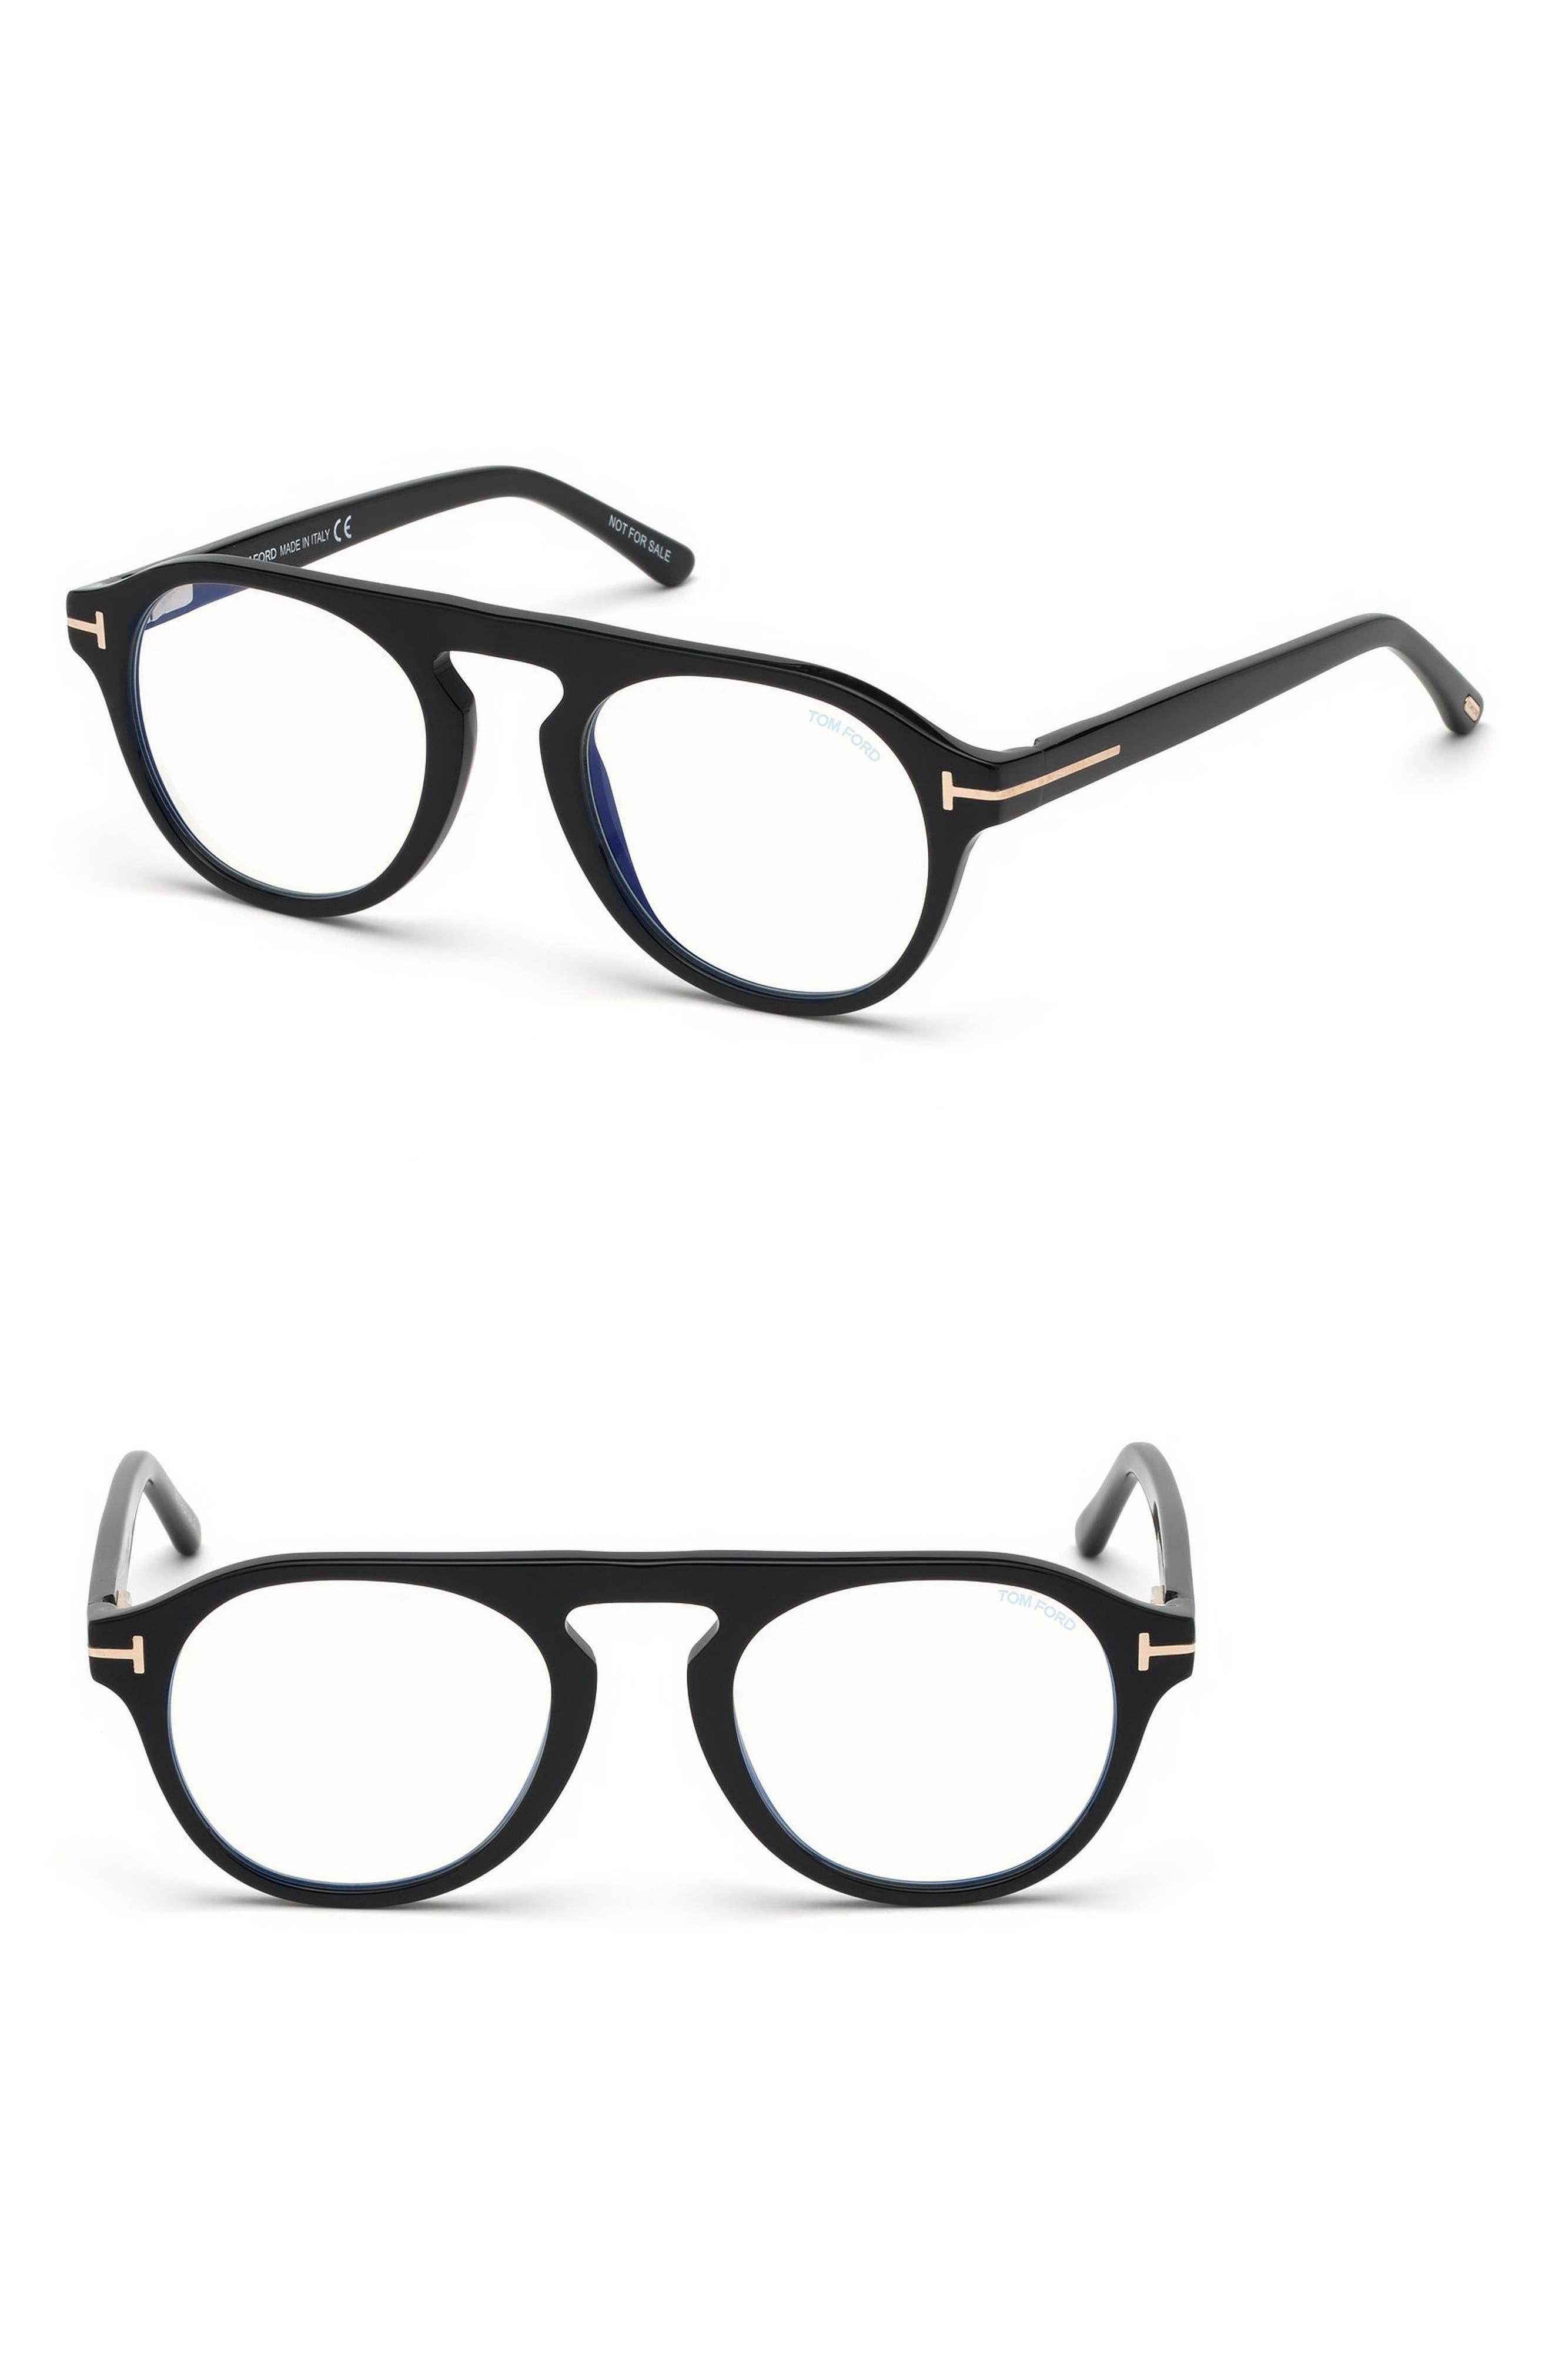 Blueblock 49mm Sunglasses with Clip-On Lens,                         Main,                         color, BLACK